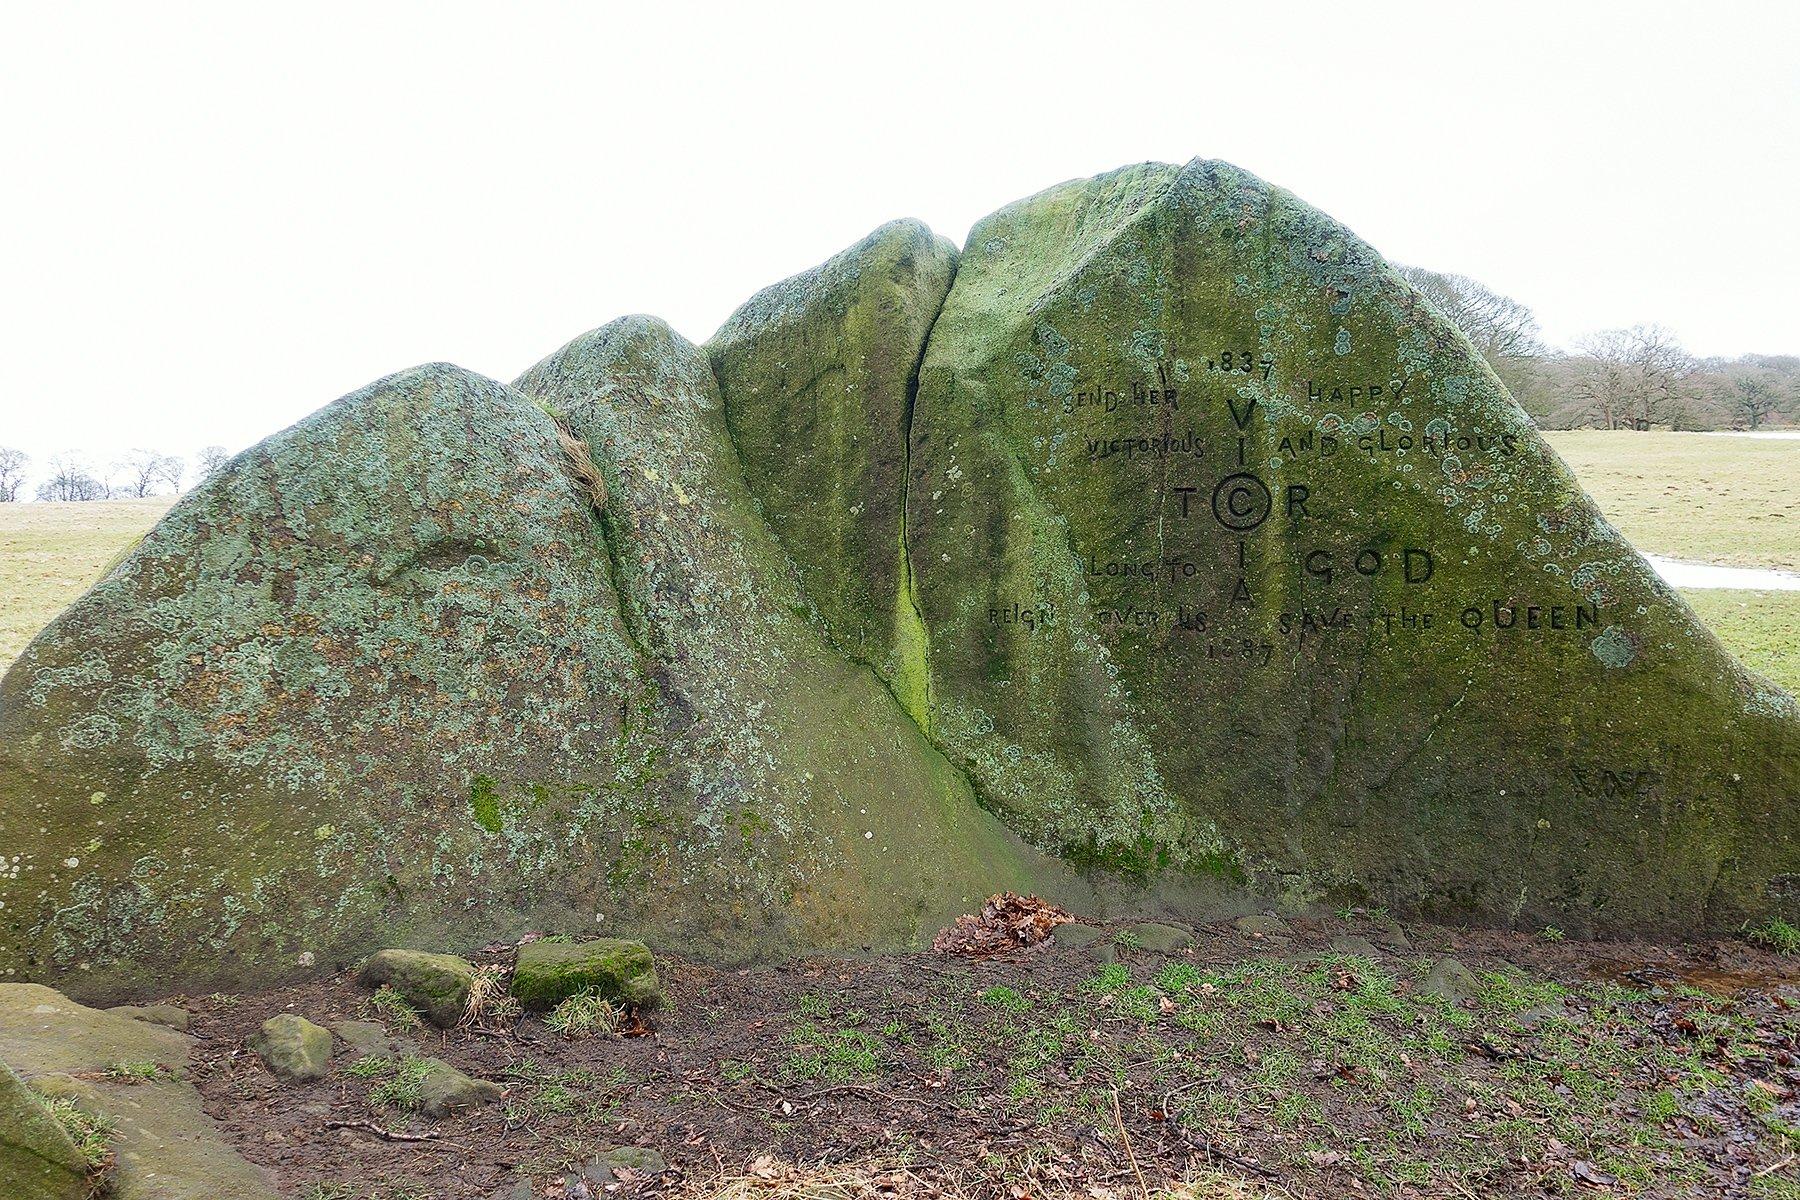 Jubilee Rock at Chatsworth